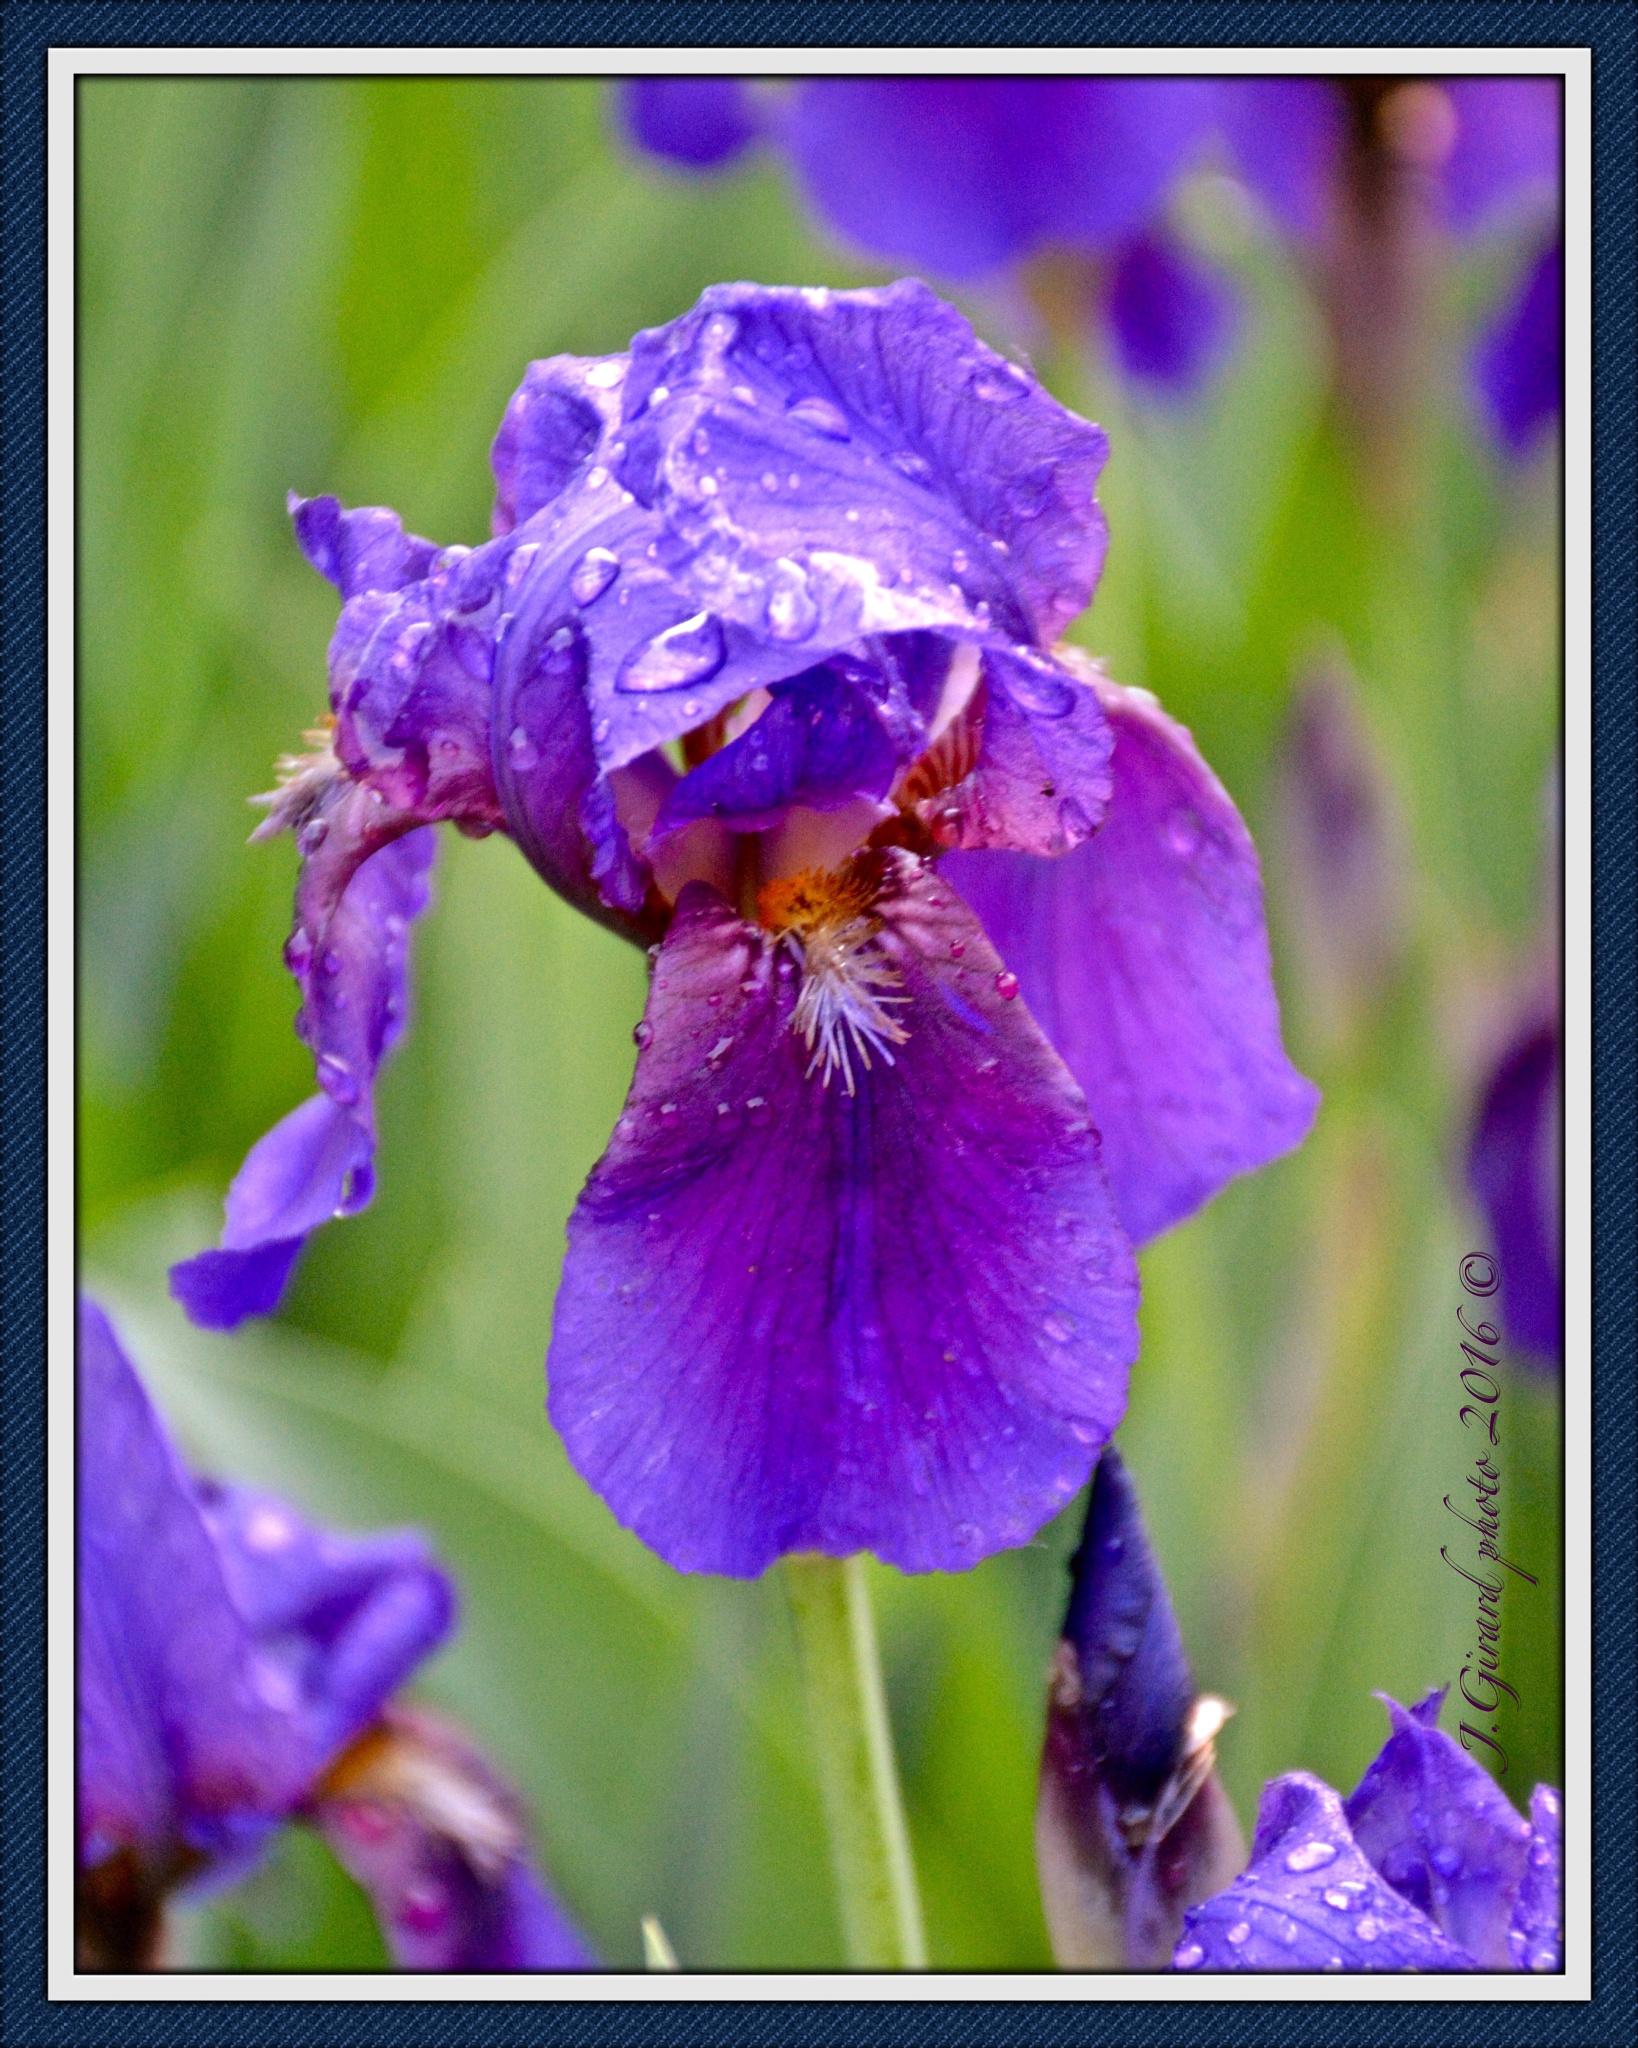 Iris by Jacques Girard